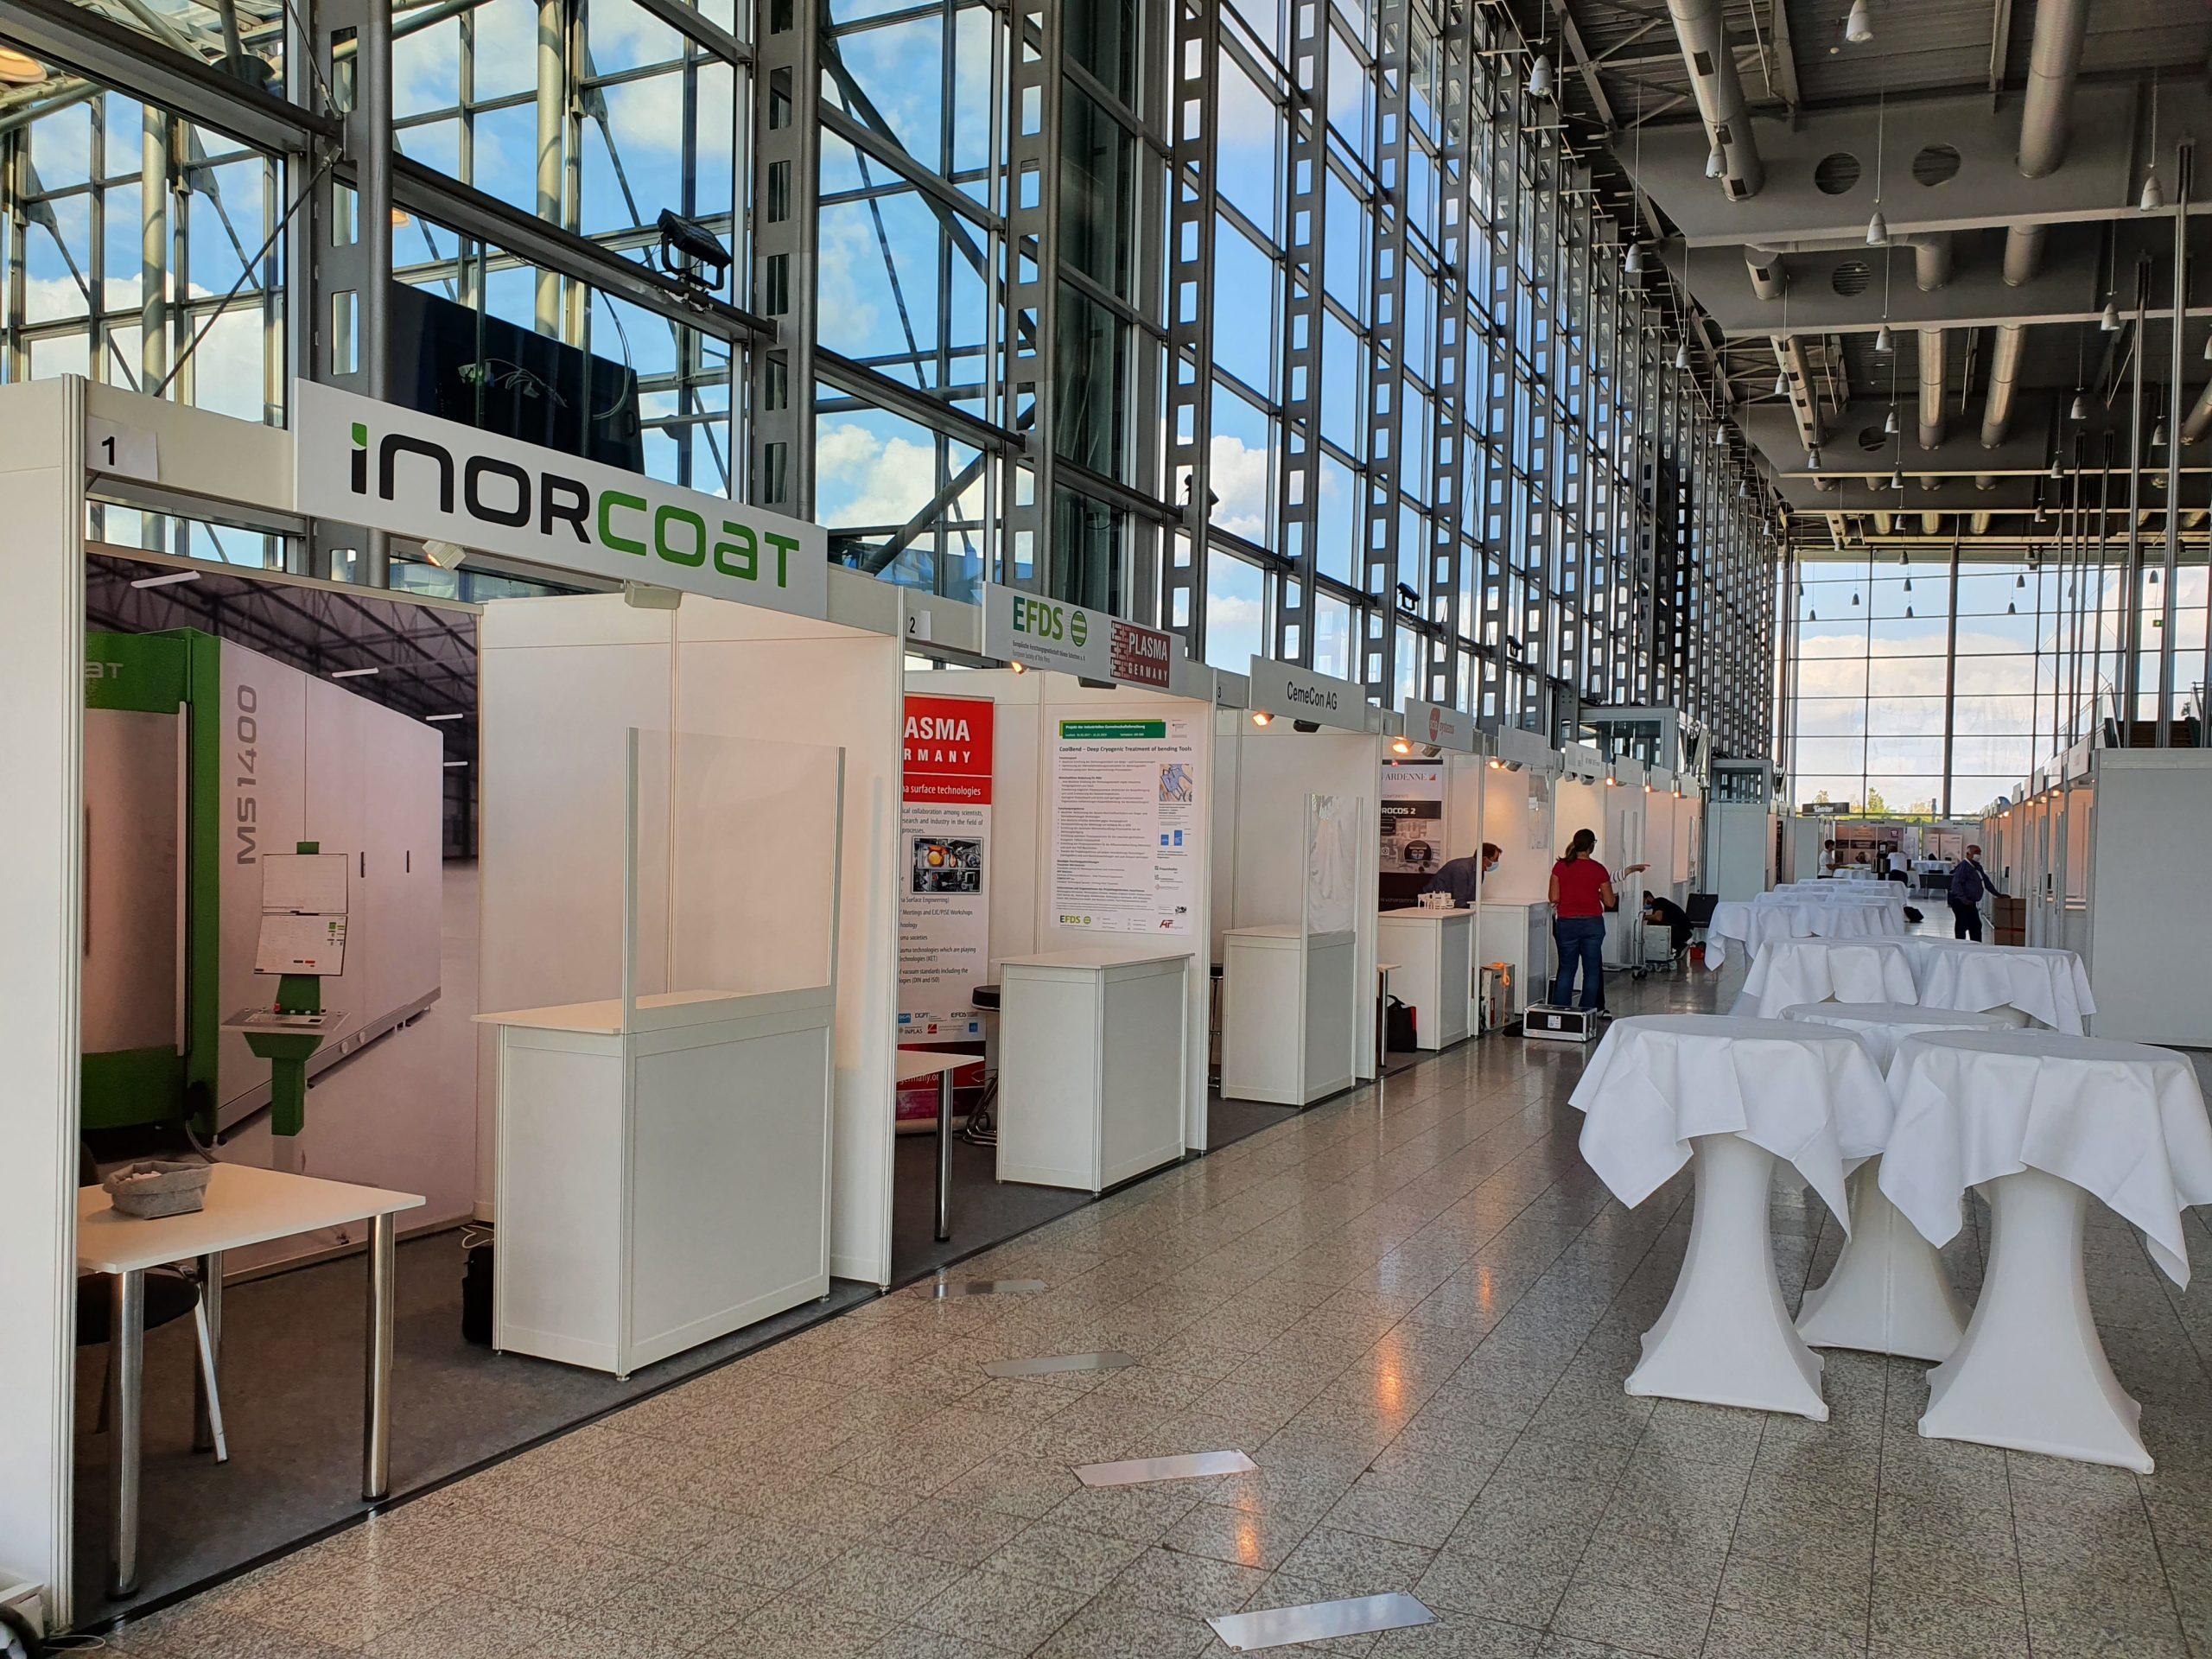 INORCOAT at SPECIAL PSE 2020 in Erfurt